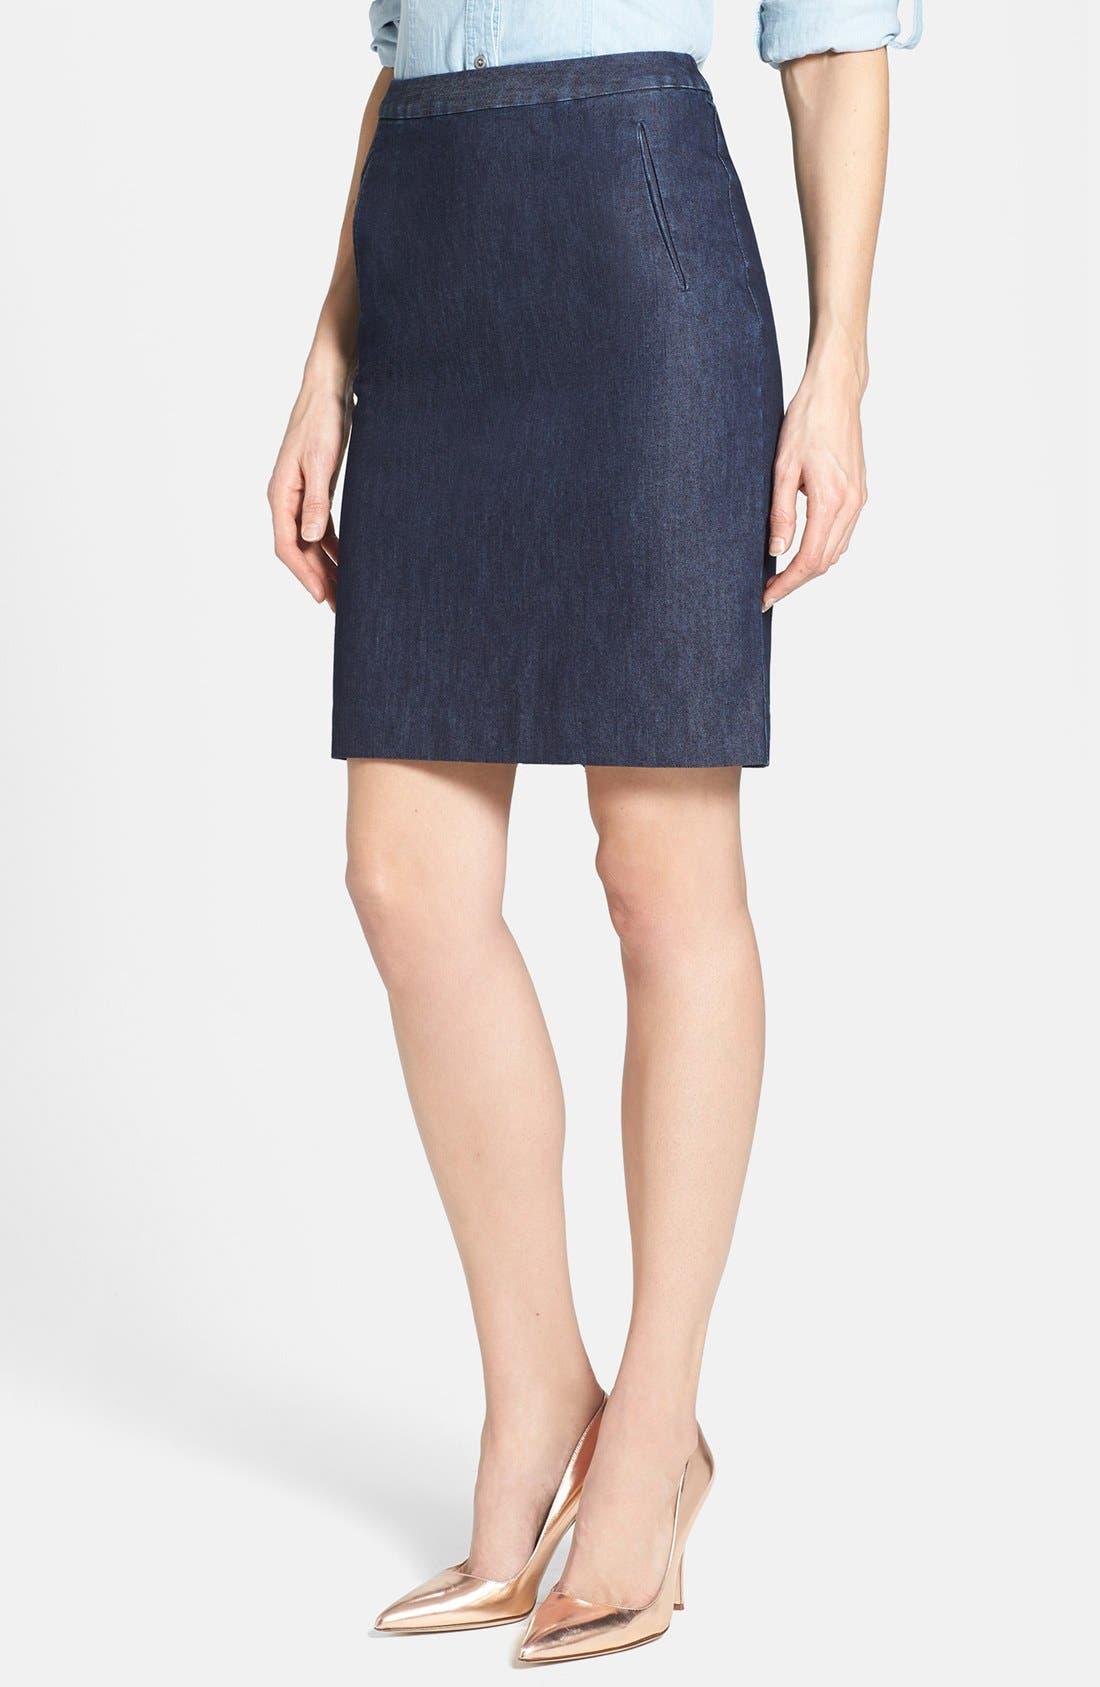 Alternate Image 1 Selected - Halogen® Stretch Cotton Blend Pencil Skirt (Regular & Petite)